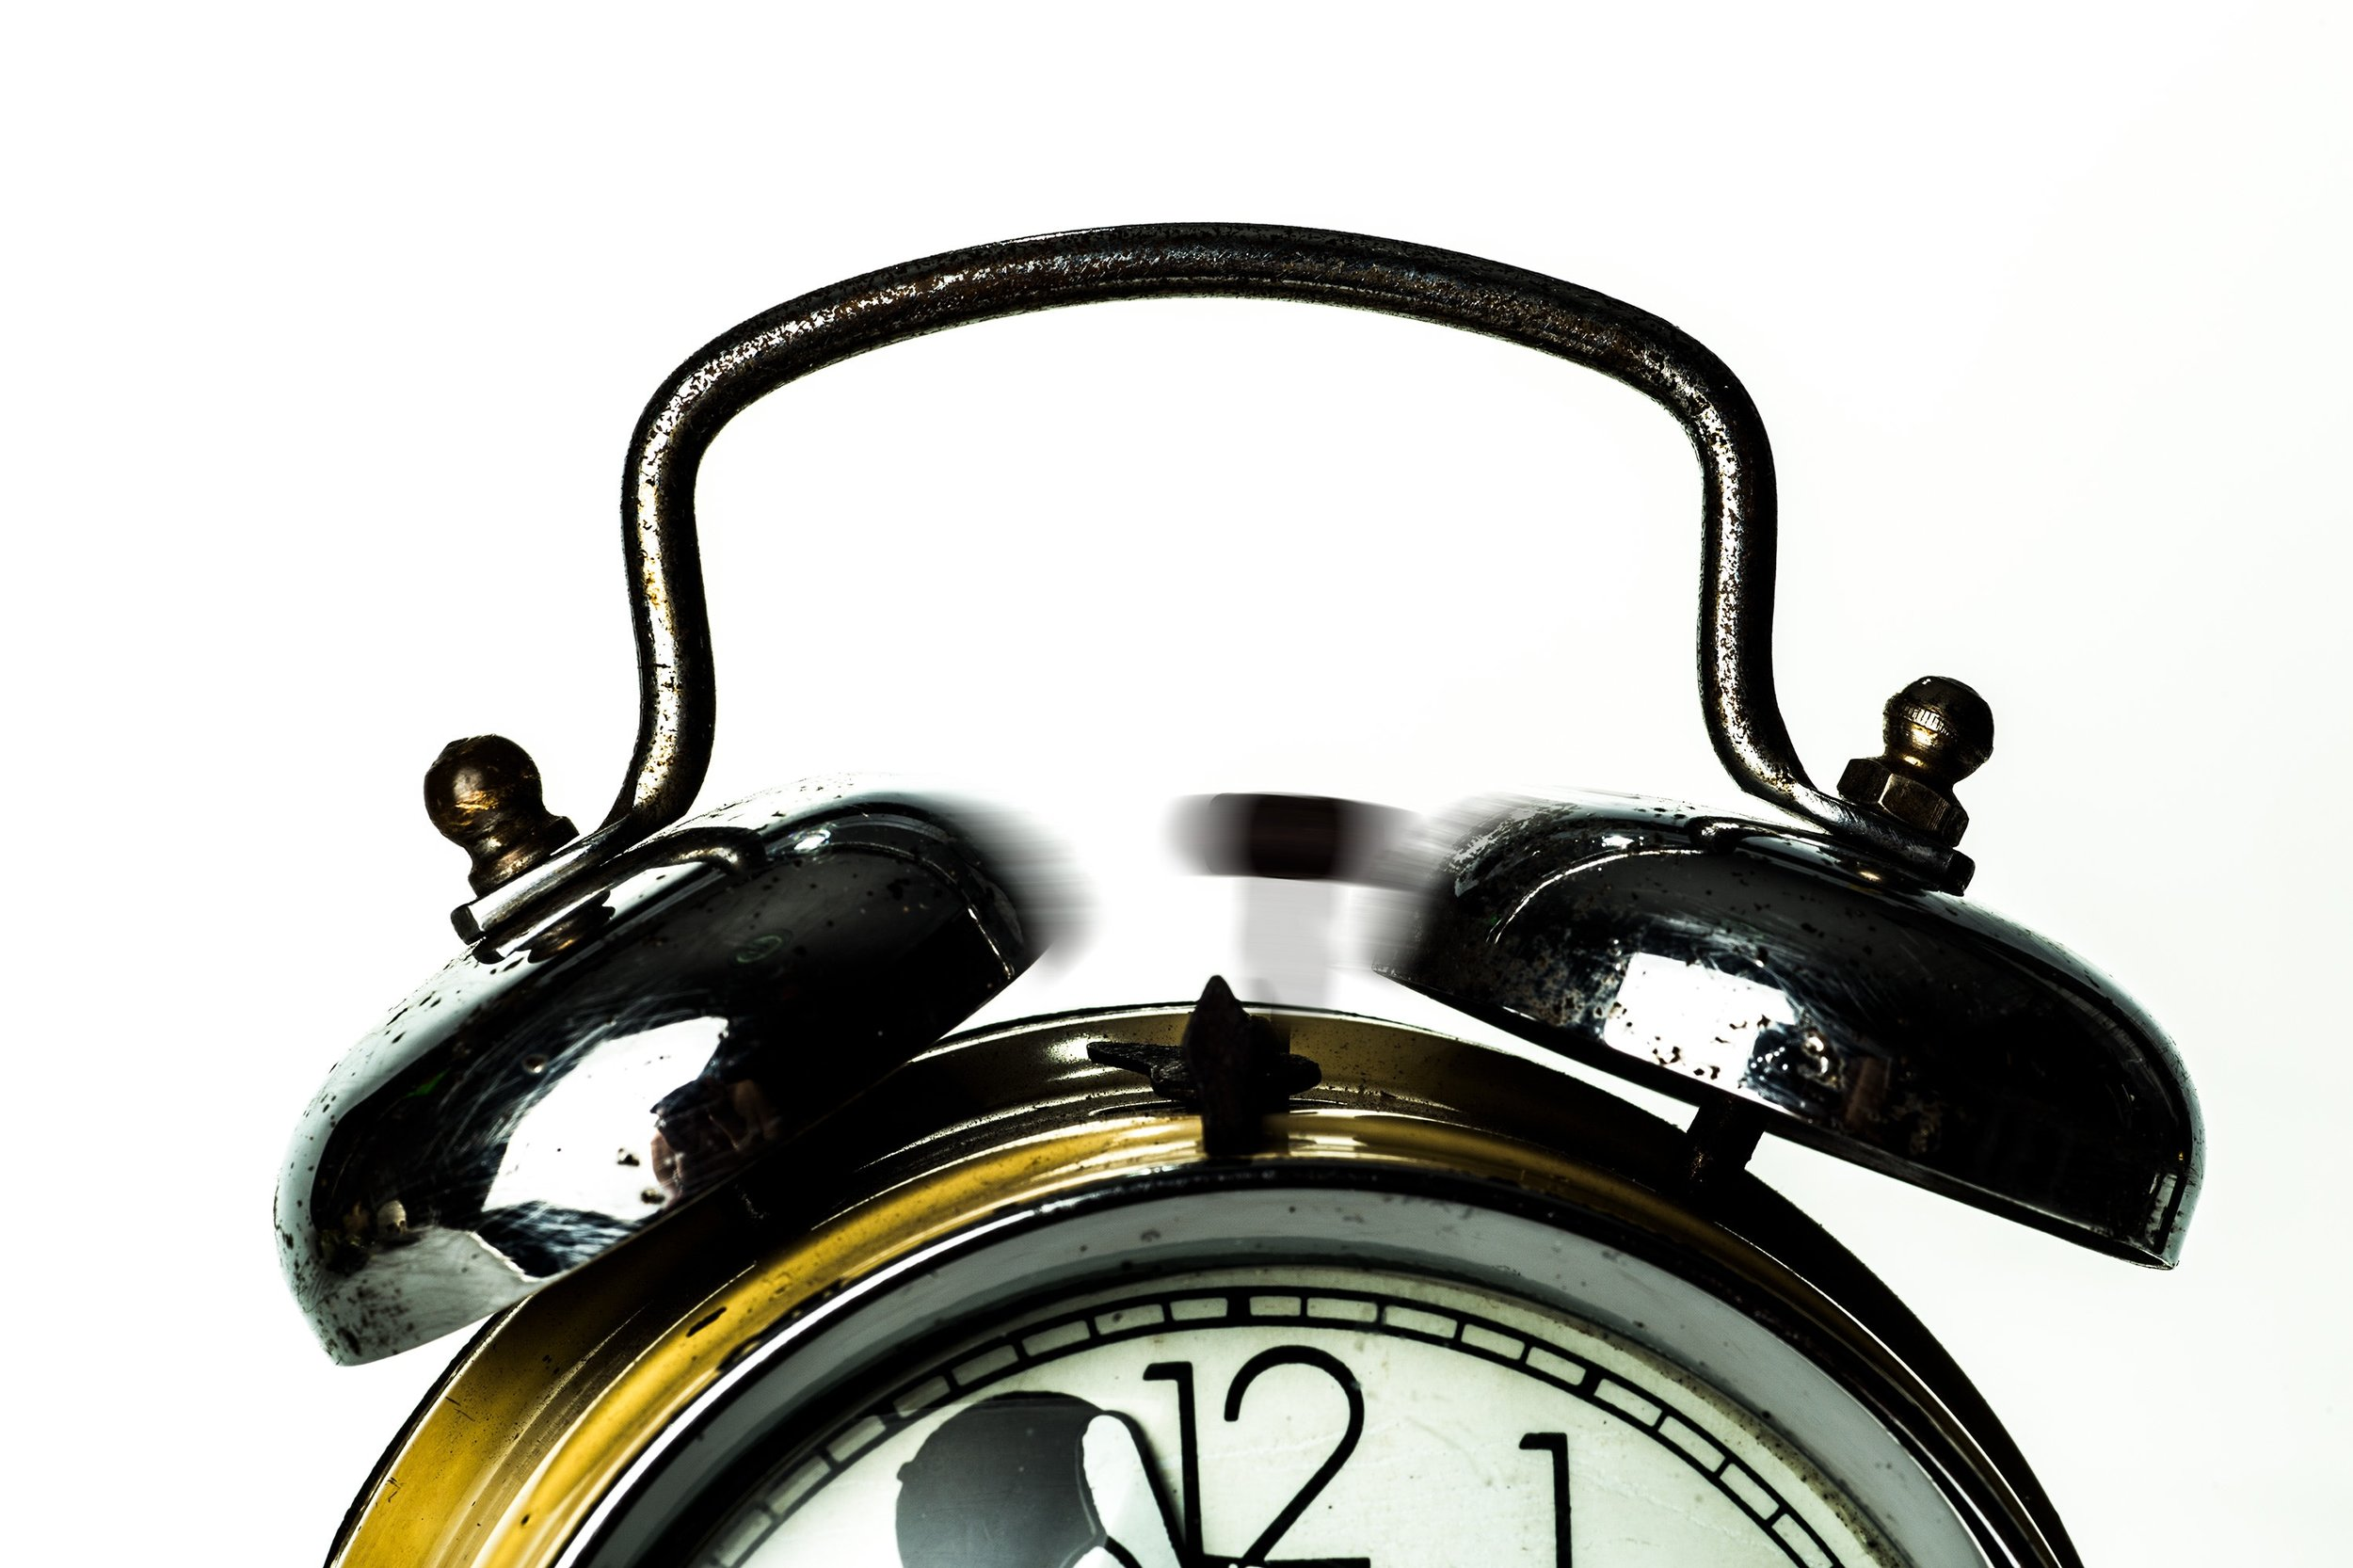 alarm-alarm-clock-analogue-682422.jpg